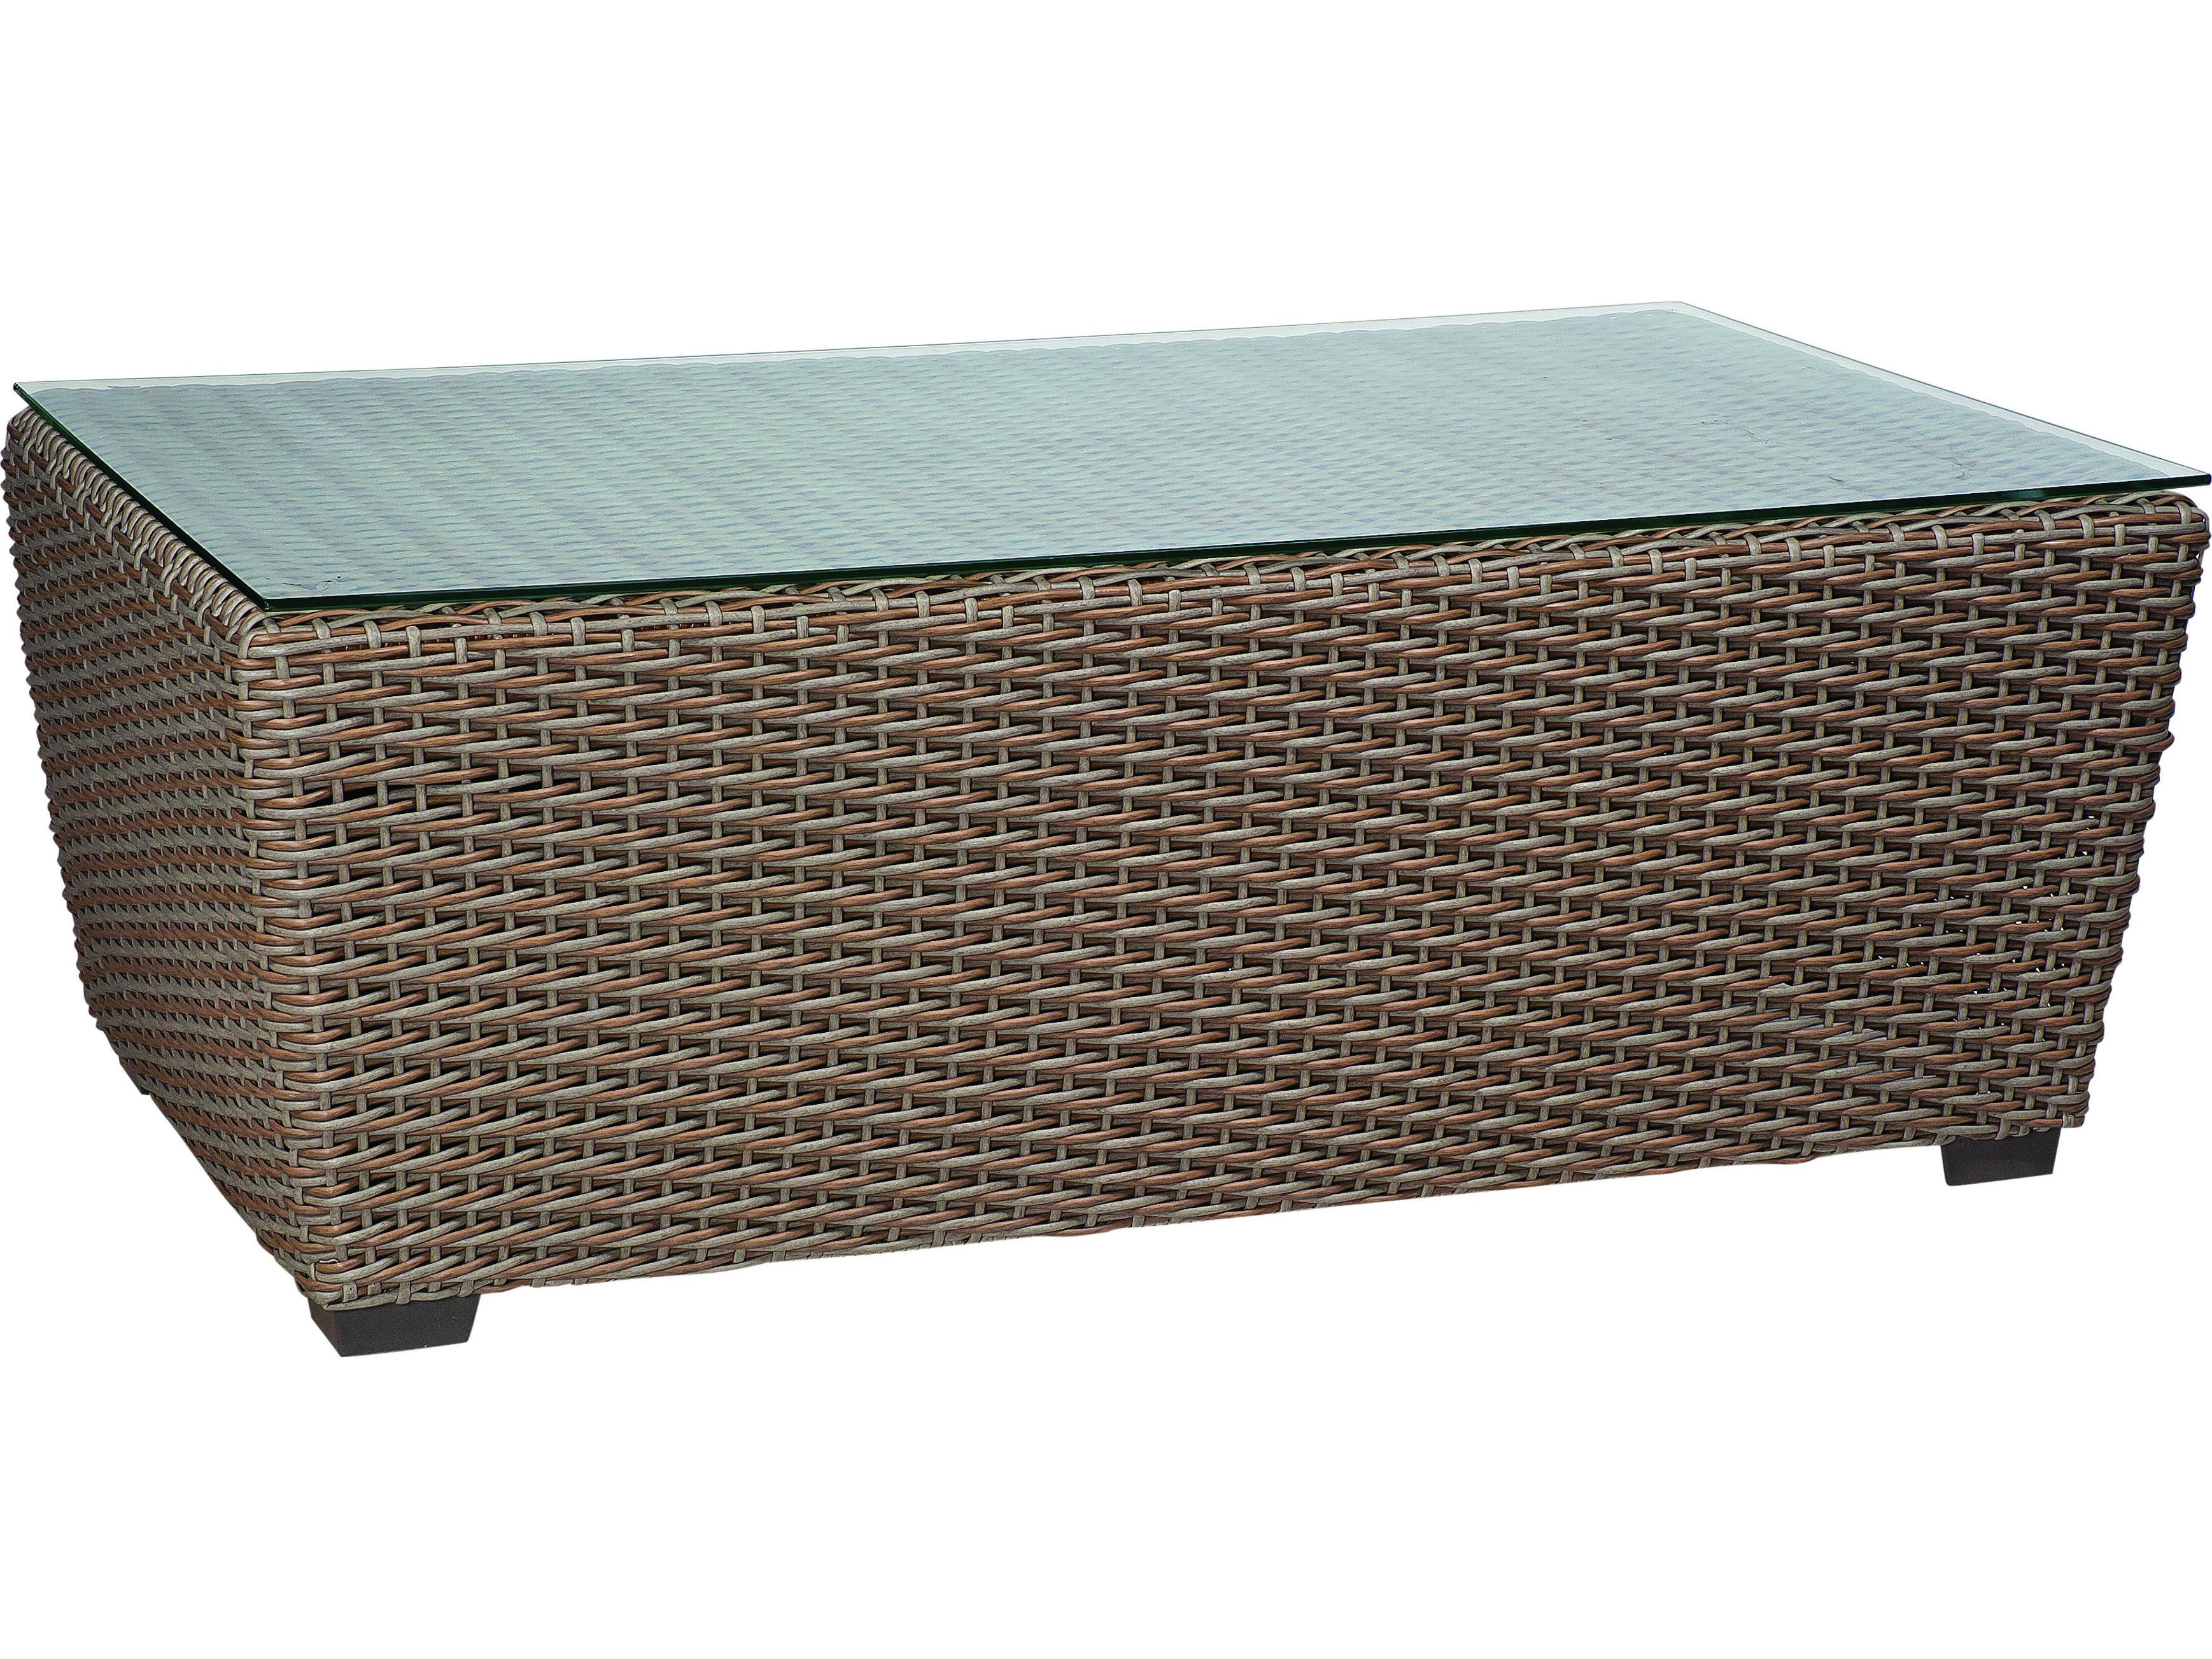 woodard cortland woven wicker round weave lounge set. Black Bedroom Furniture Sets. Home Design Ideas